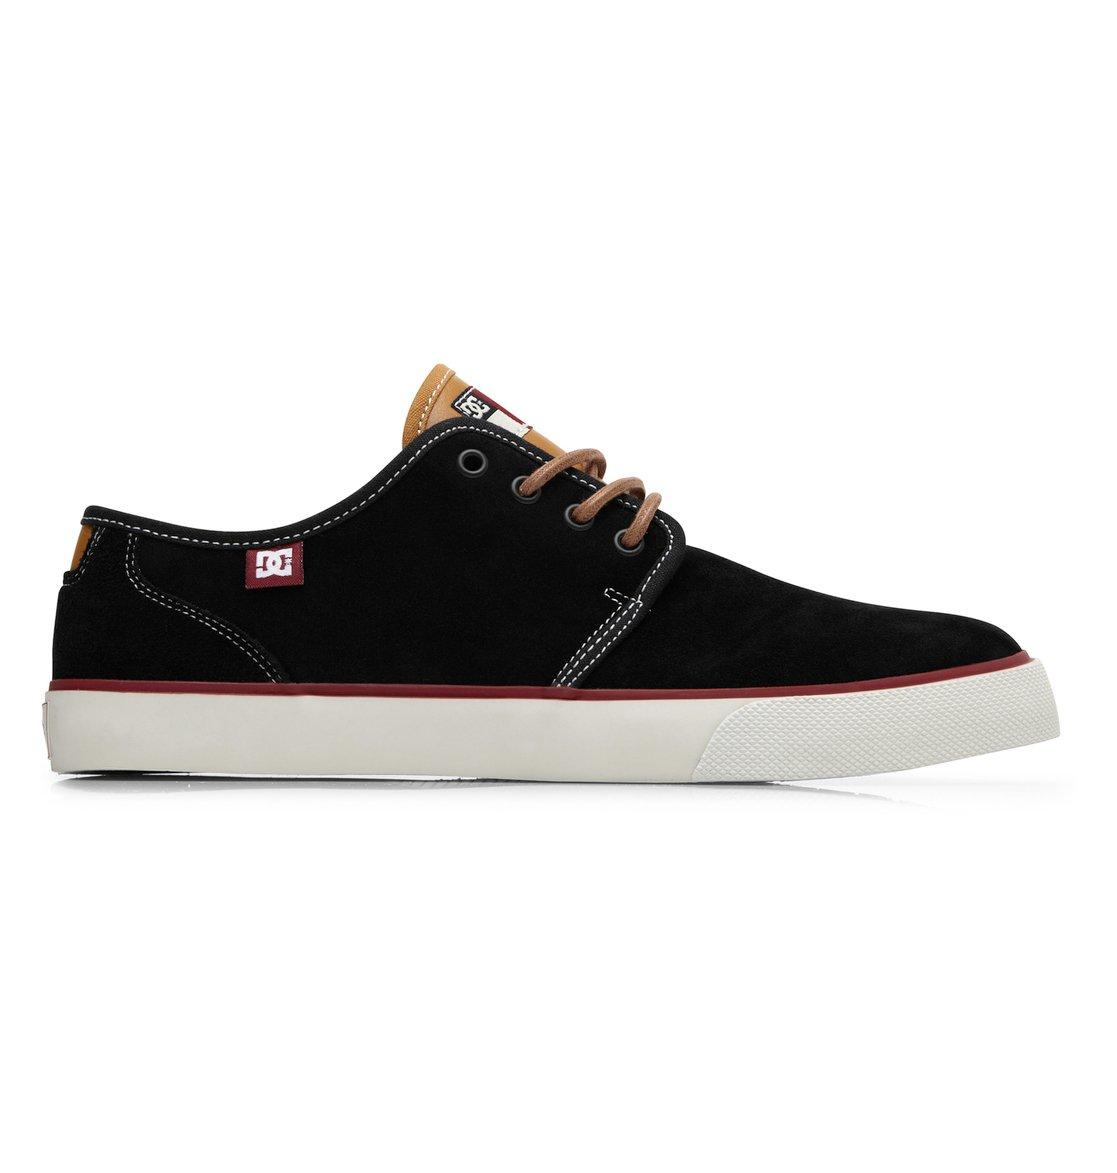 DC Shoes Studio LE - Zapatillas bajas - hombre - EU 40.5 9tFAuQxKl